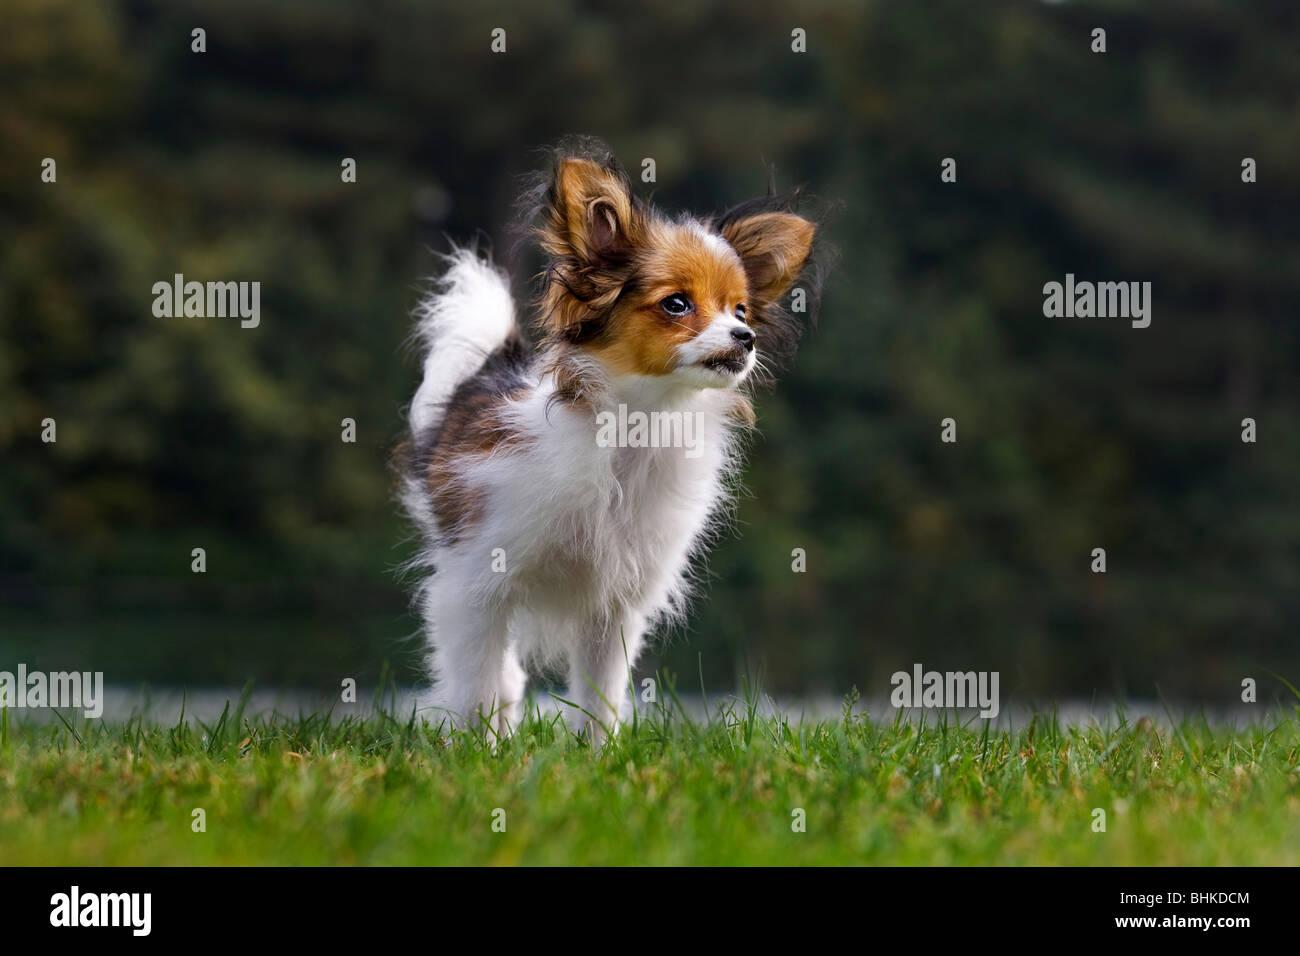 Papillon dog (Canis lupus familiaris) in garden - Stock Image